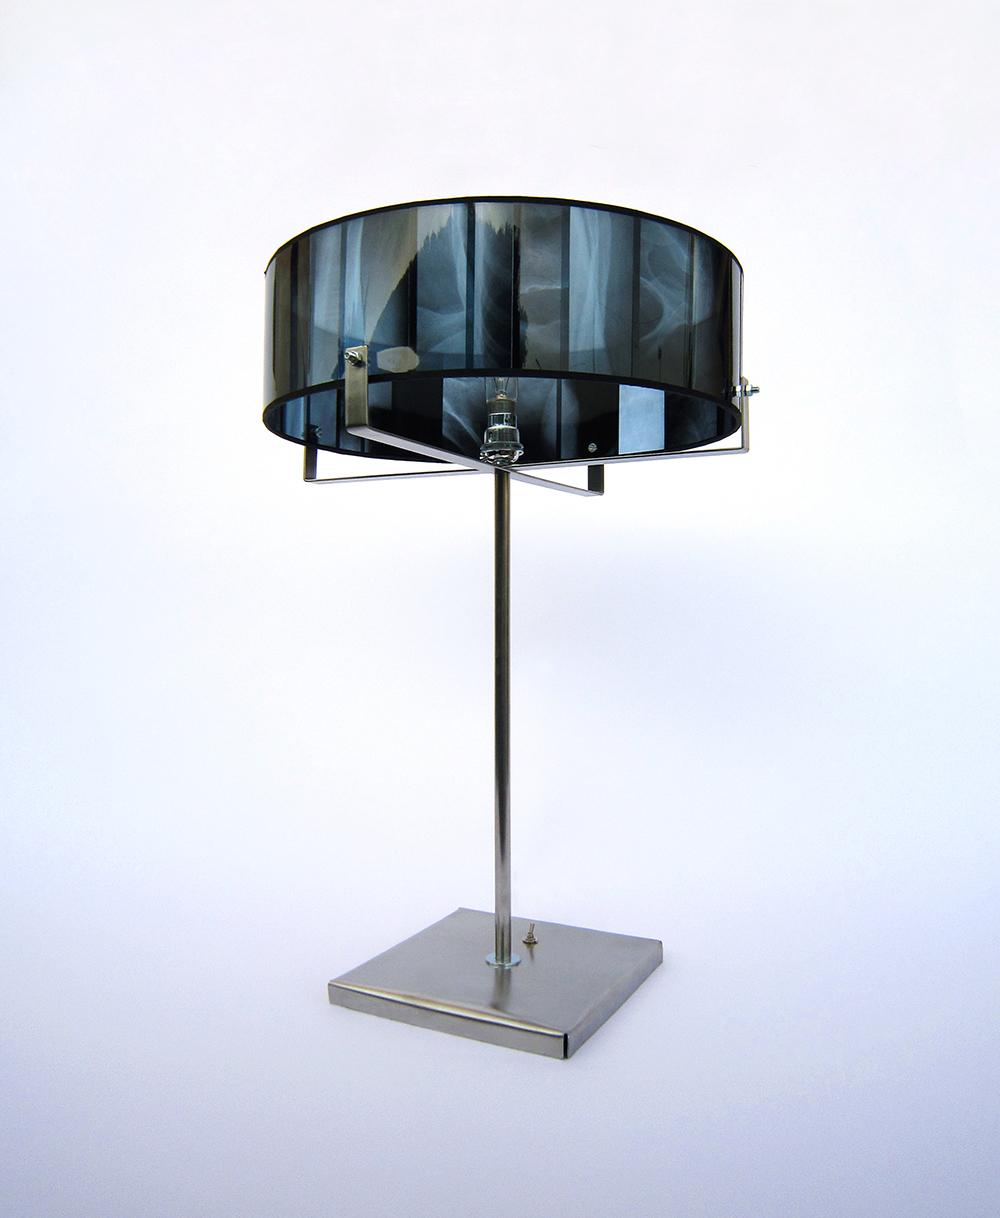 aurelie wozniak creatrice plasticienne artiste designer. Black Bedroom Furniture Sets. Home Design Ideas